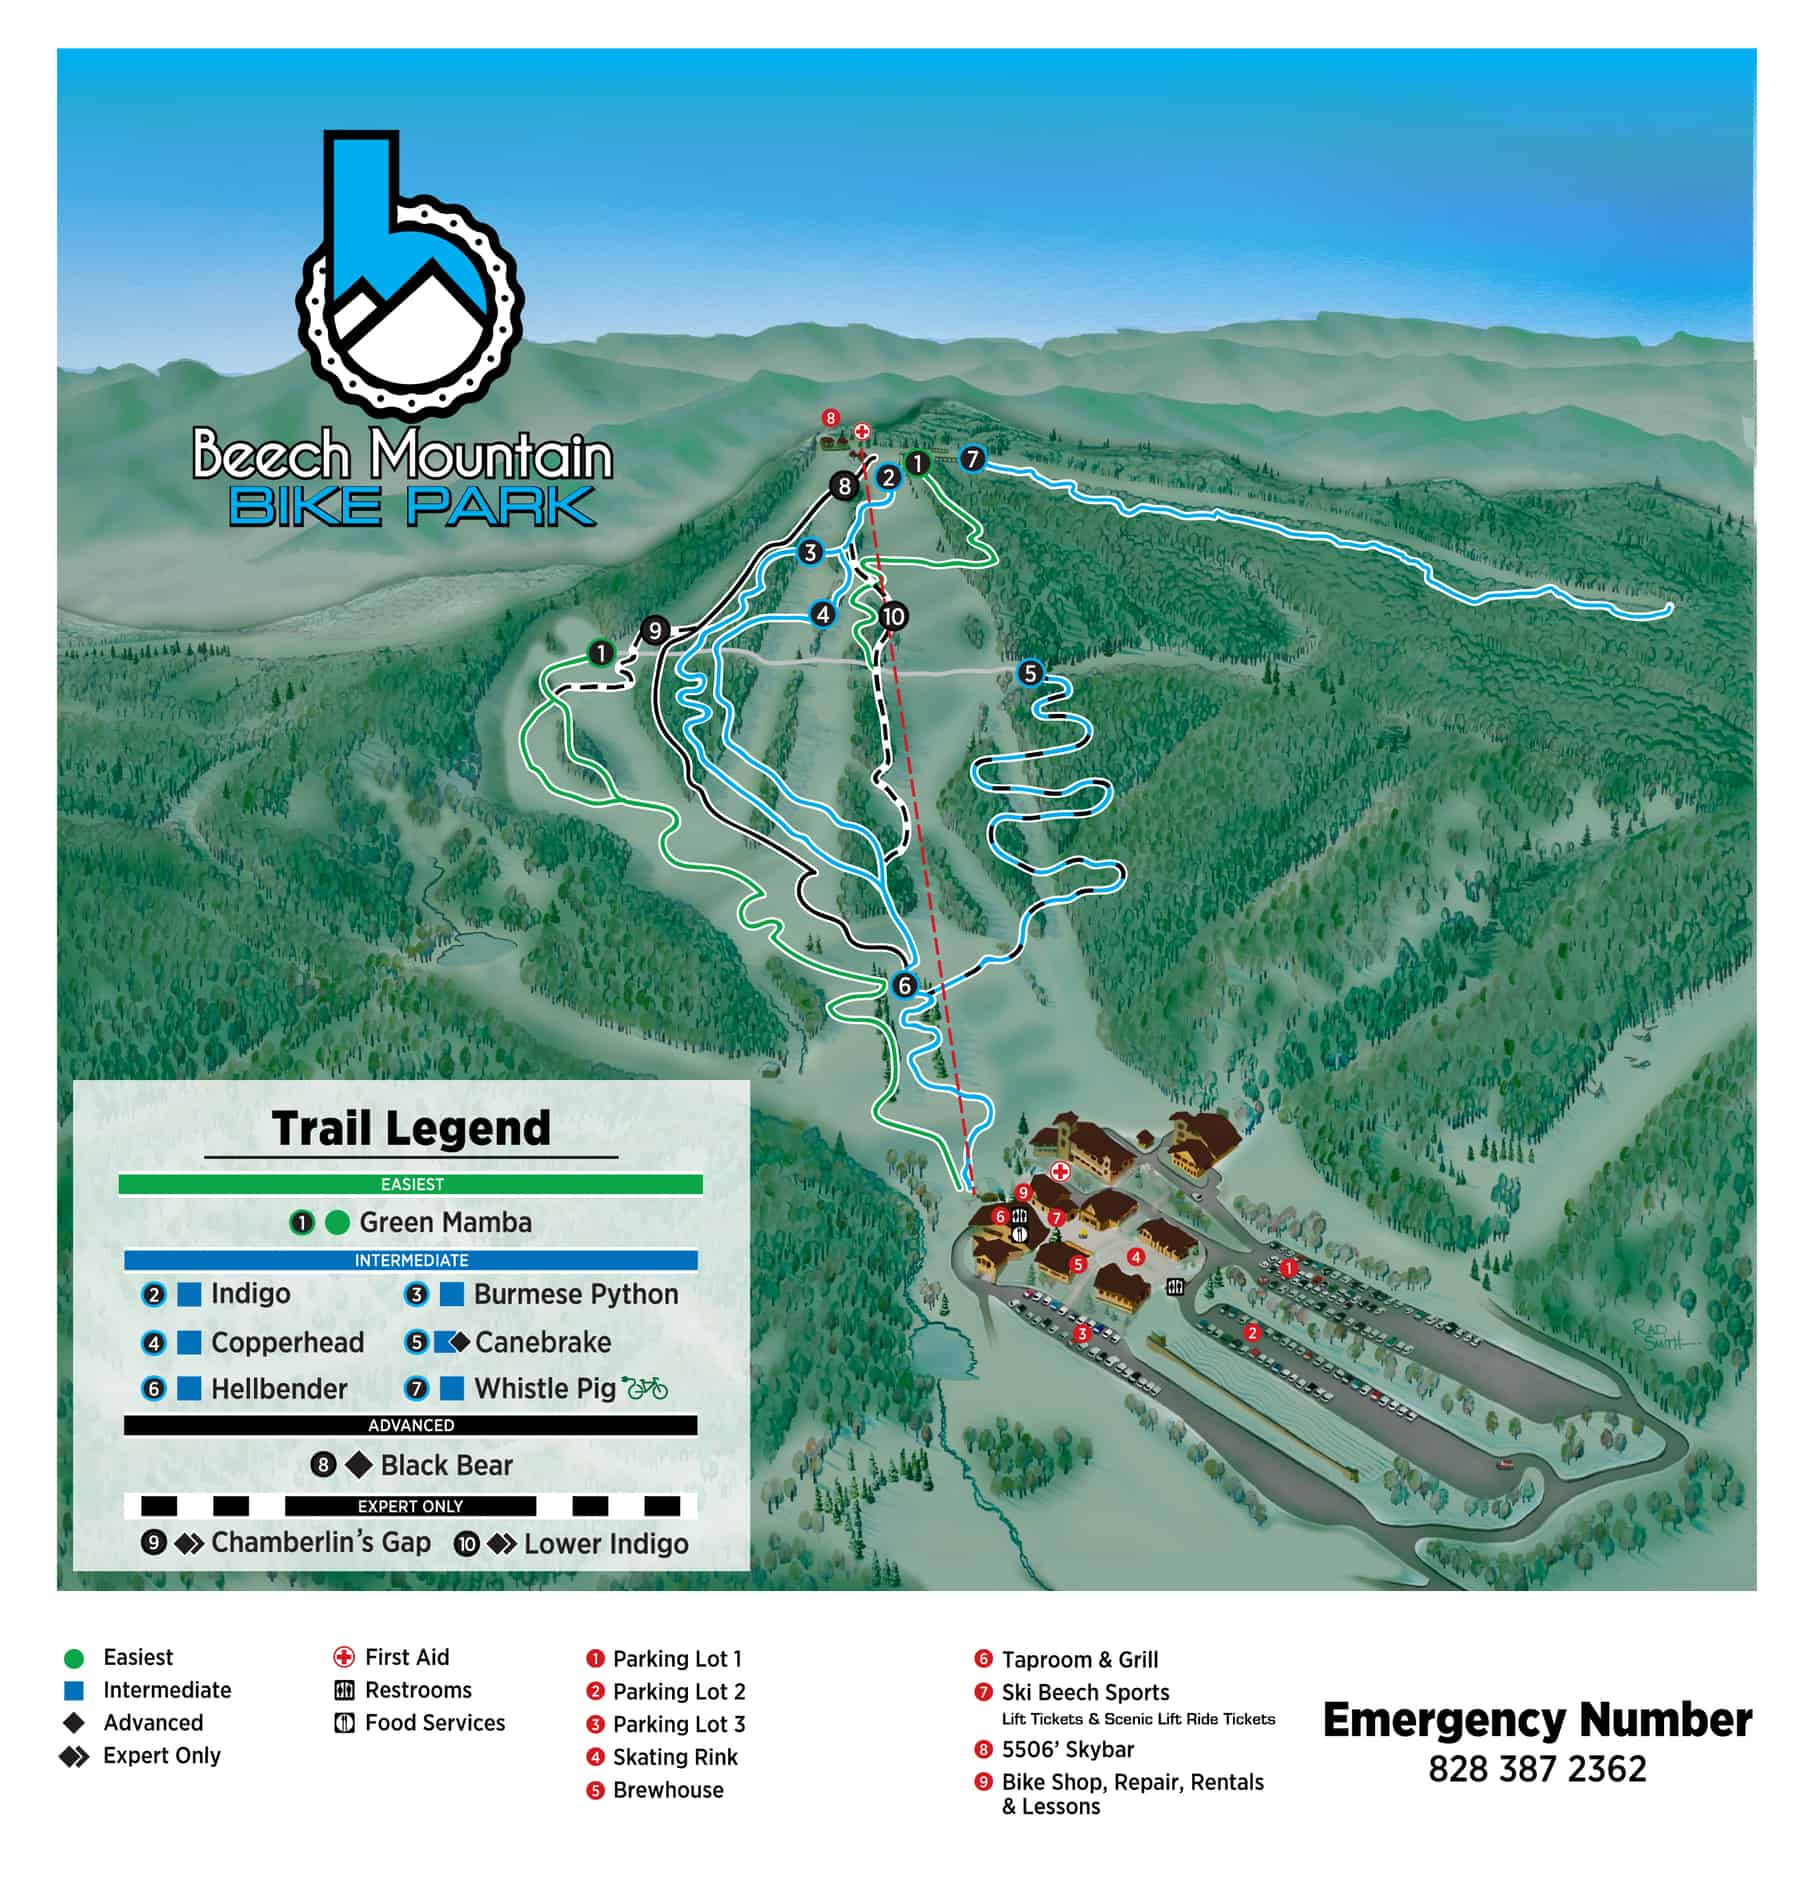 Summer Trail Map - Beech Mountain Resort on sapphire valley nc map, nc lake map, nc elevation map, asheville nc map, nc art map, nc terrain map, nc mountain map, nc snow map, nc city map, nc travel map, nc school map, nc water map, nc wine map, beech mountain north carolina map, nc restaurant map, nc beach map, nc boating map, nc golf map, nc fun map, nc camping map,